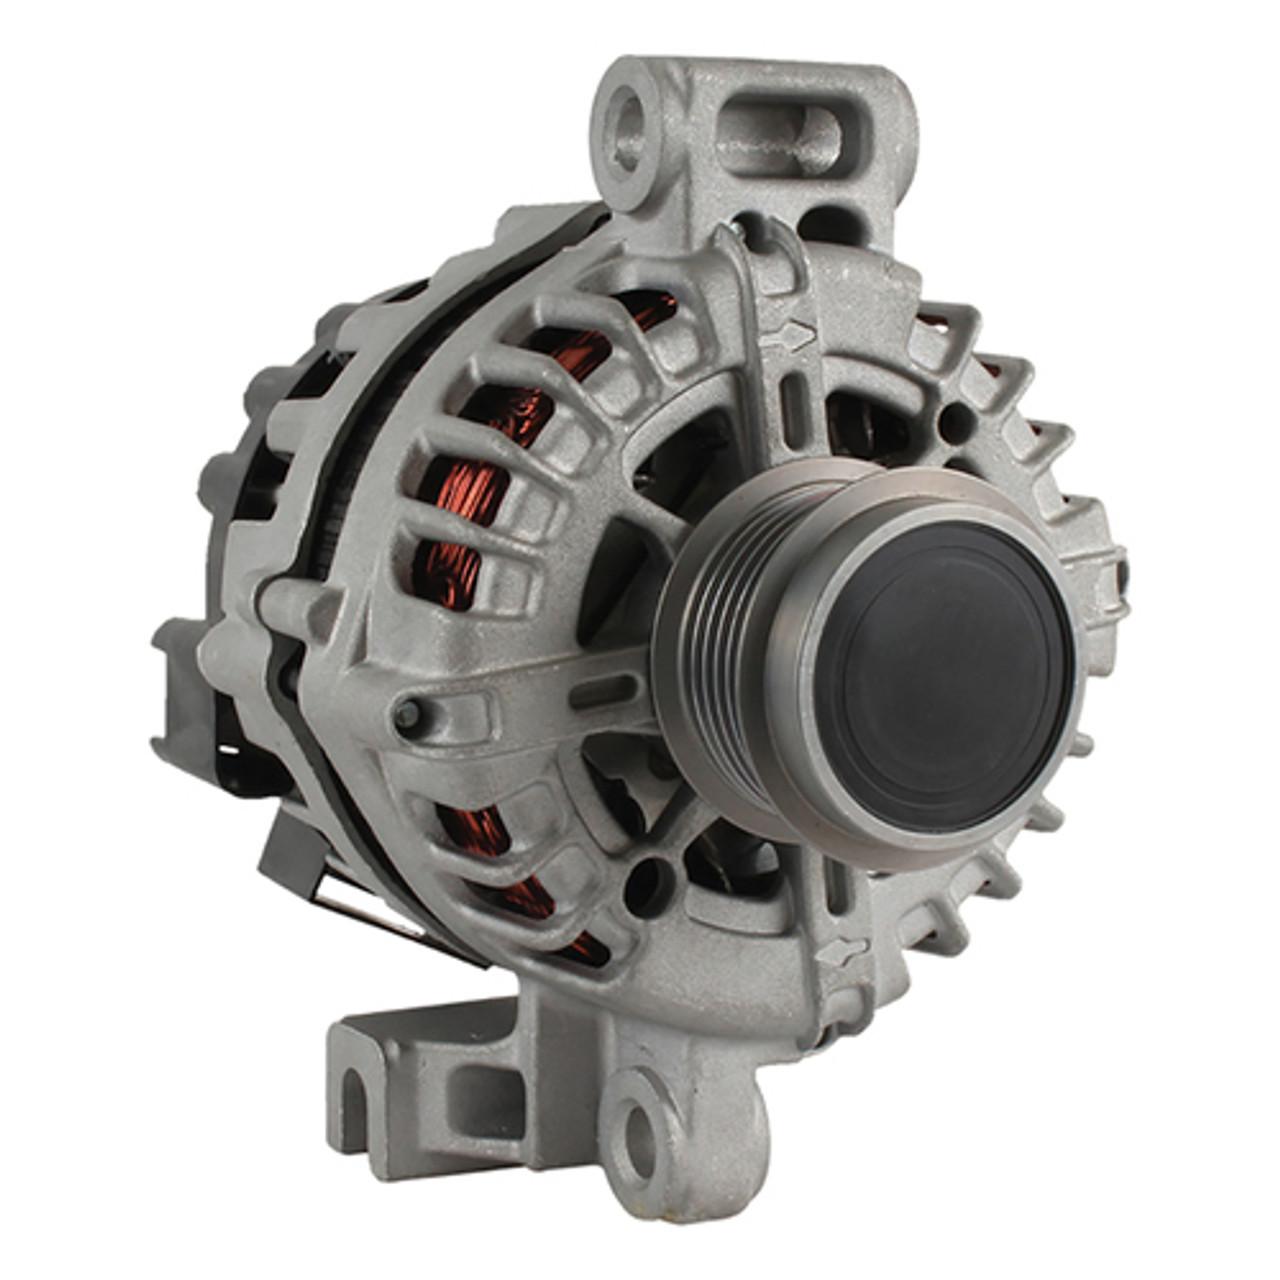 New Alternator Replacement GMC Canyon 3.6 2015-,2016  11845